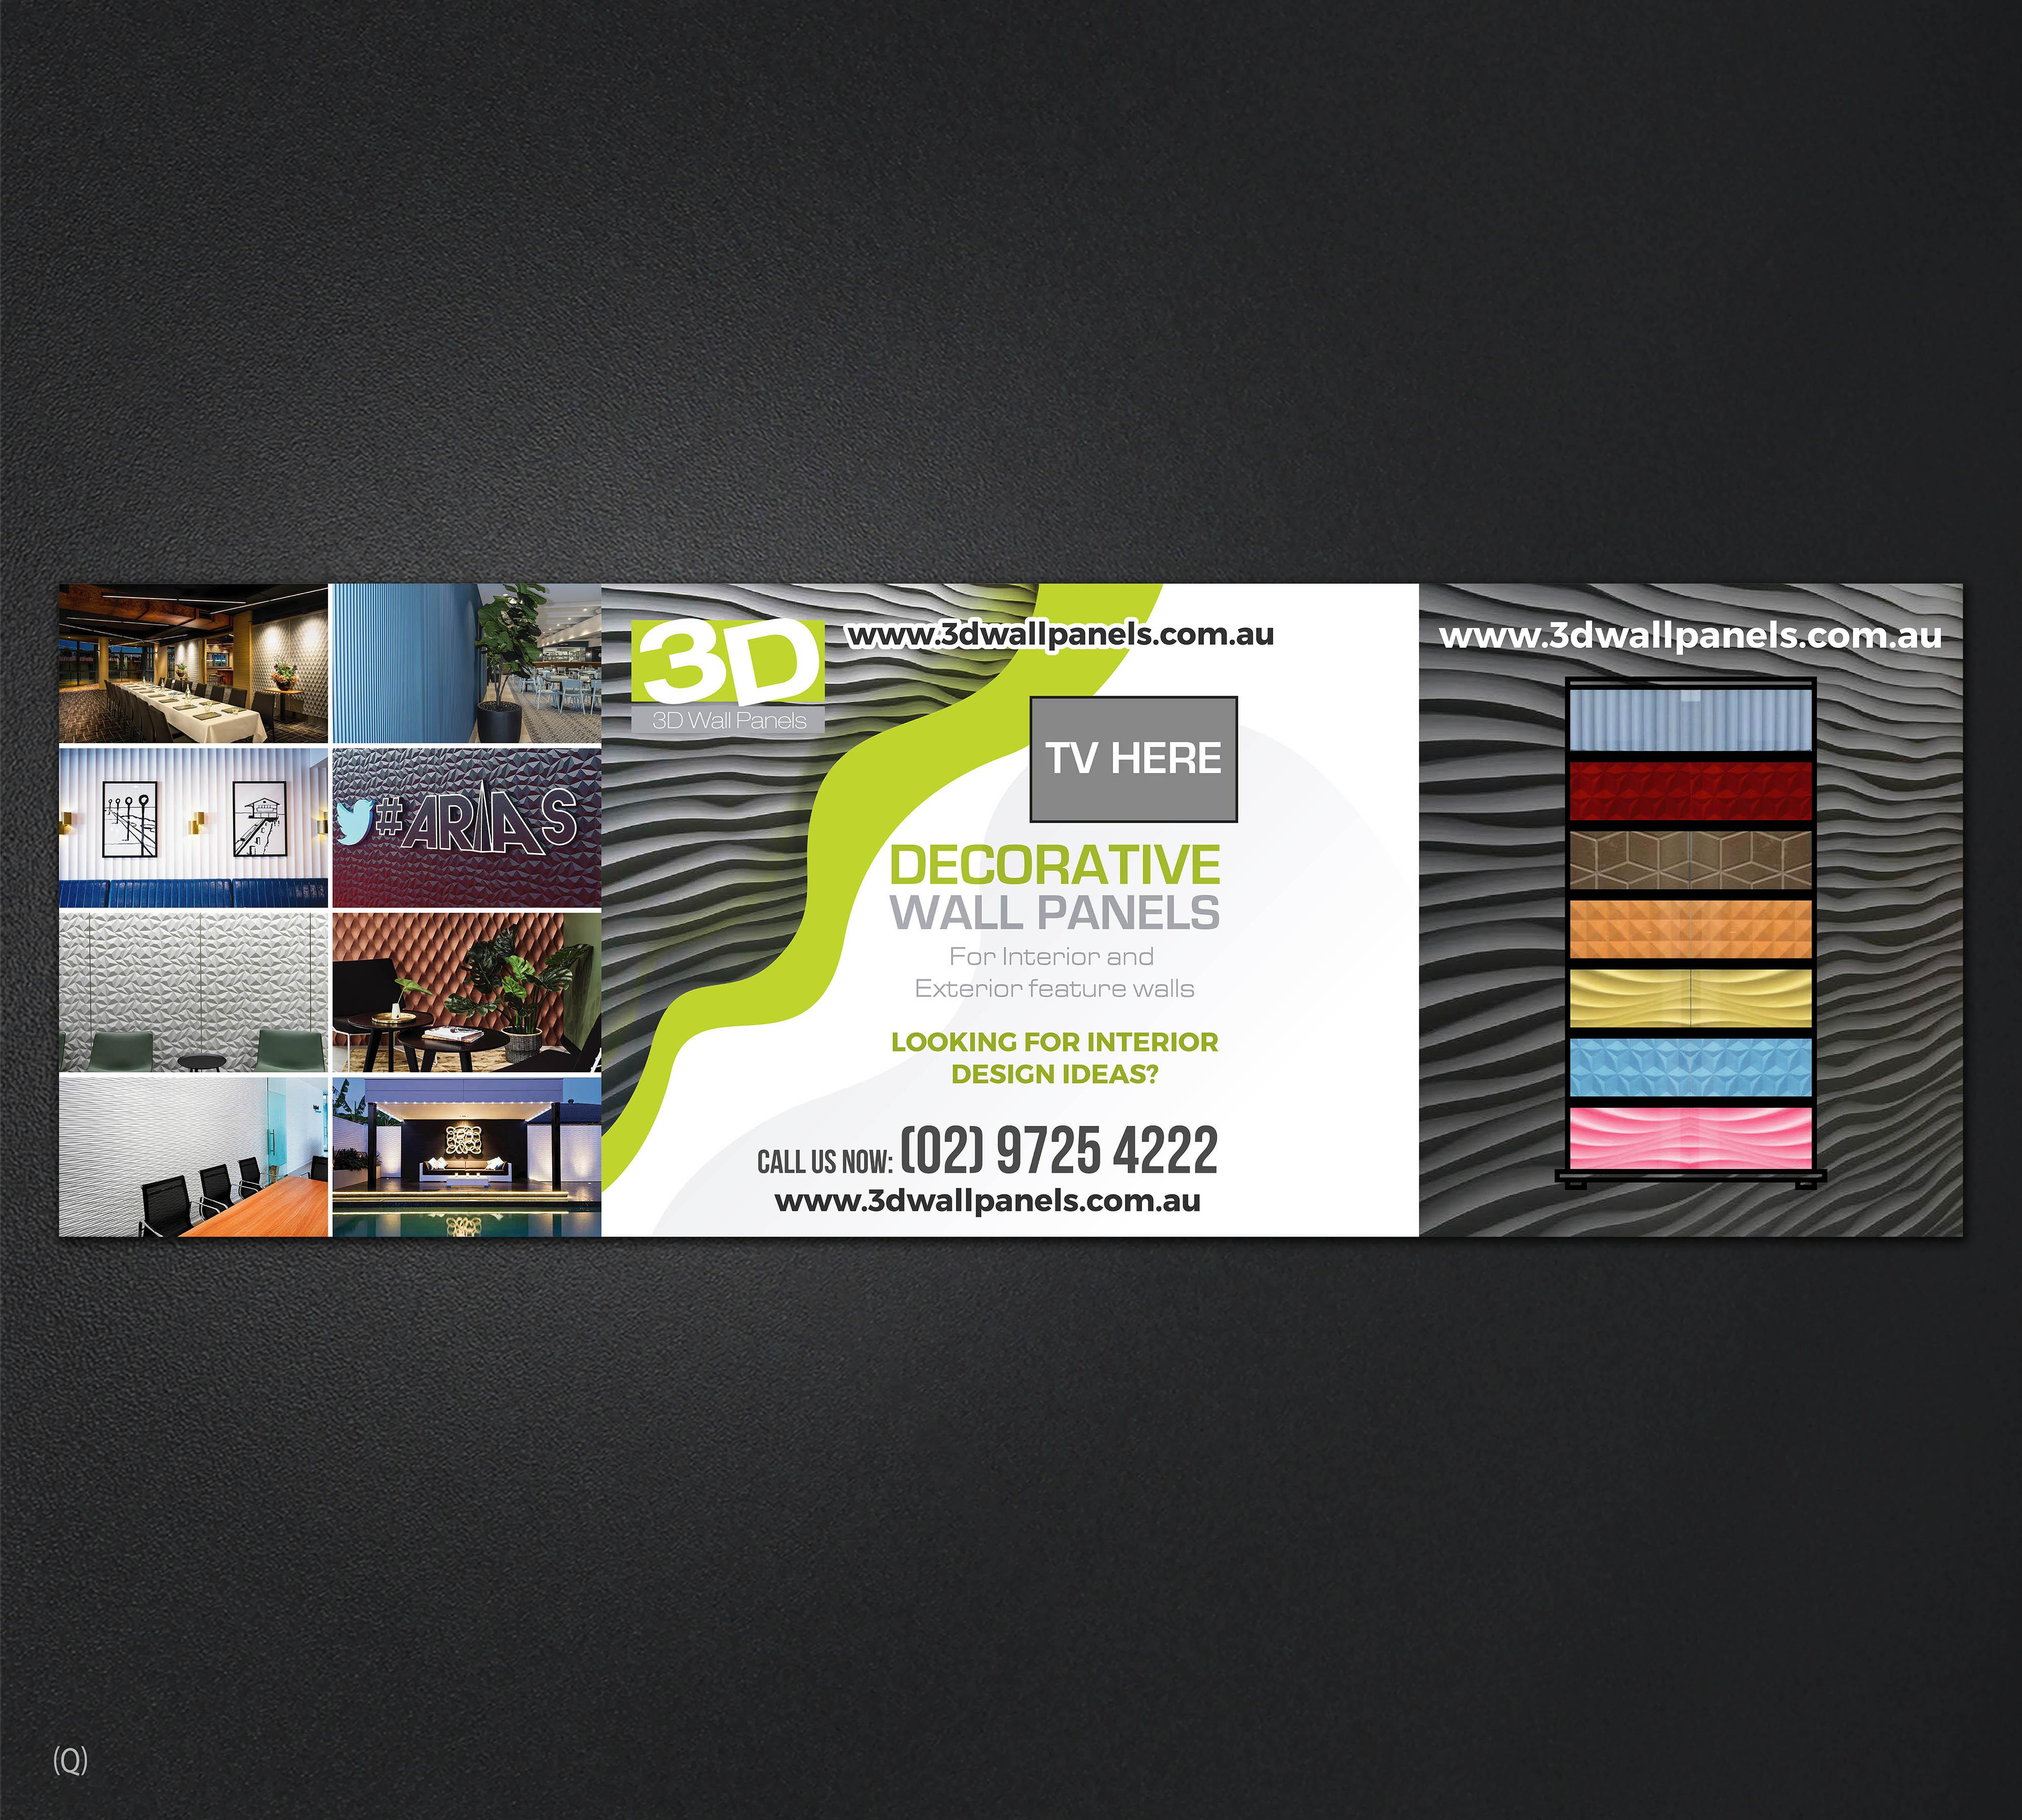 Elegant Playful Interior Design Trade Show Booth Design For 3d Wall Panels By Designanddevelopment Design 22053849